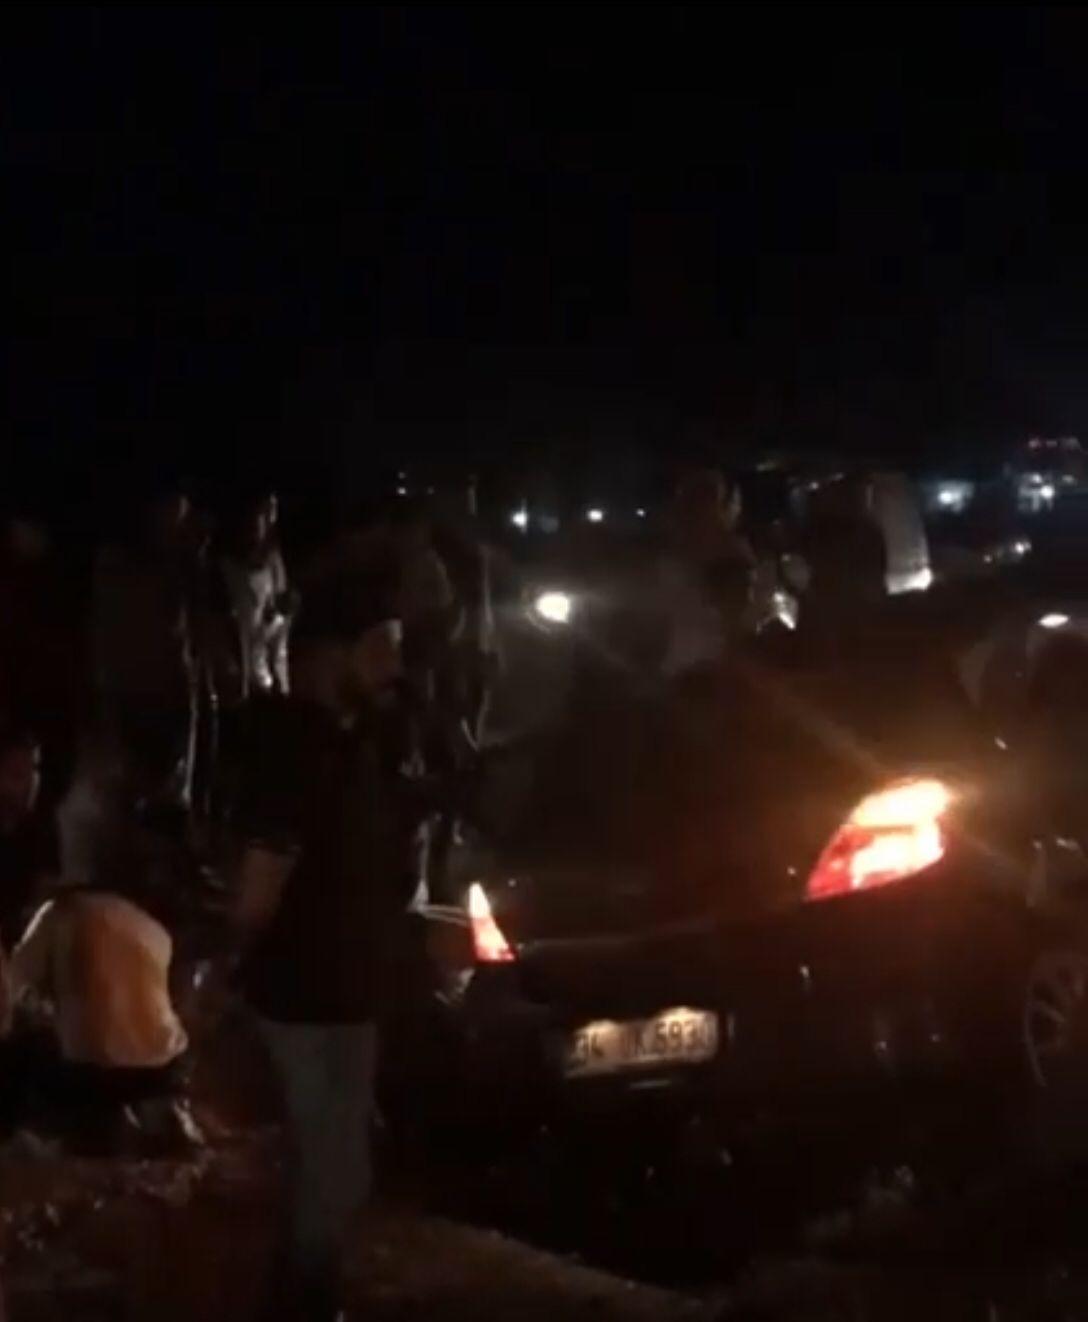 Batman-Bismil karayolunda kaza: 5 yaralı